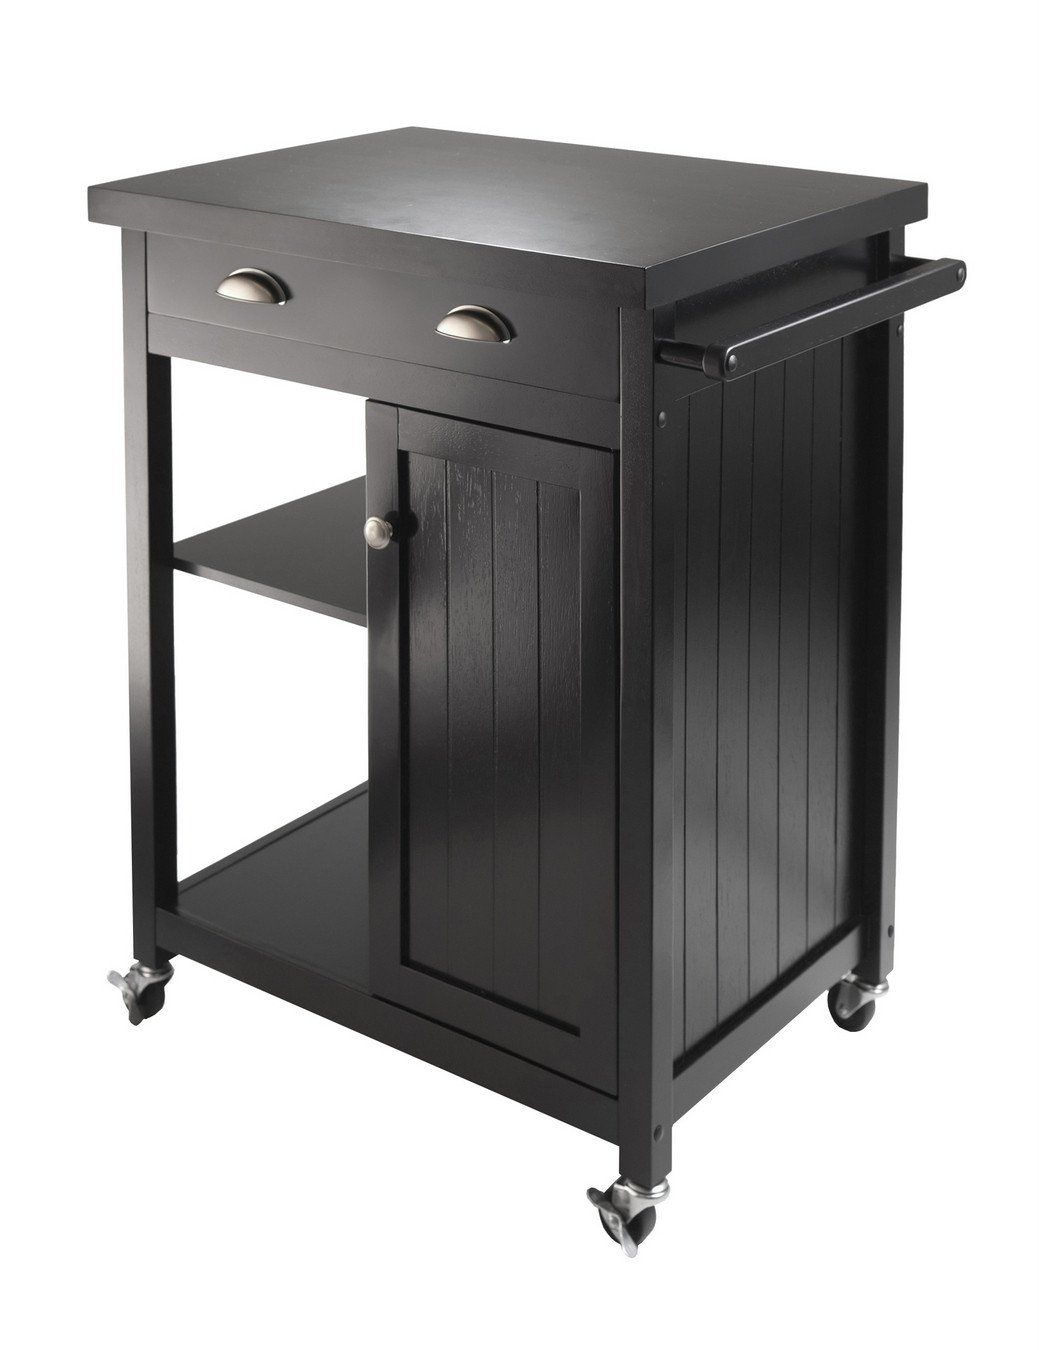 Classy Black Timber Urban Kitchen Cart With Wainscot Panel